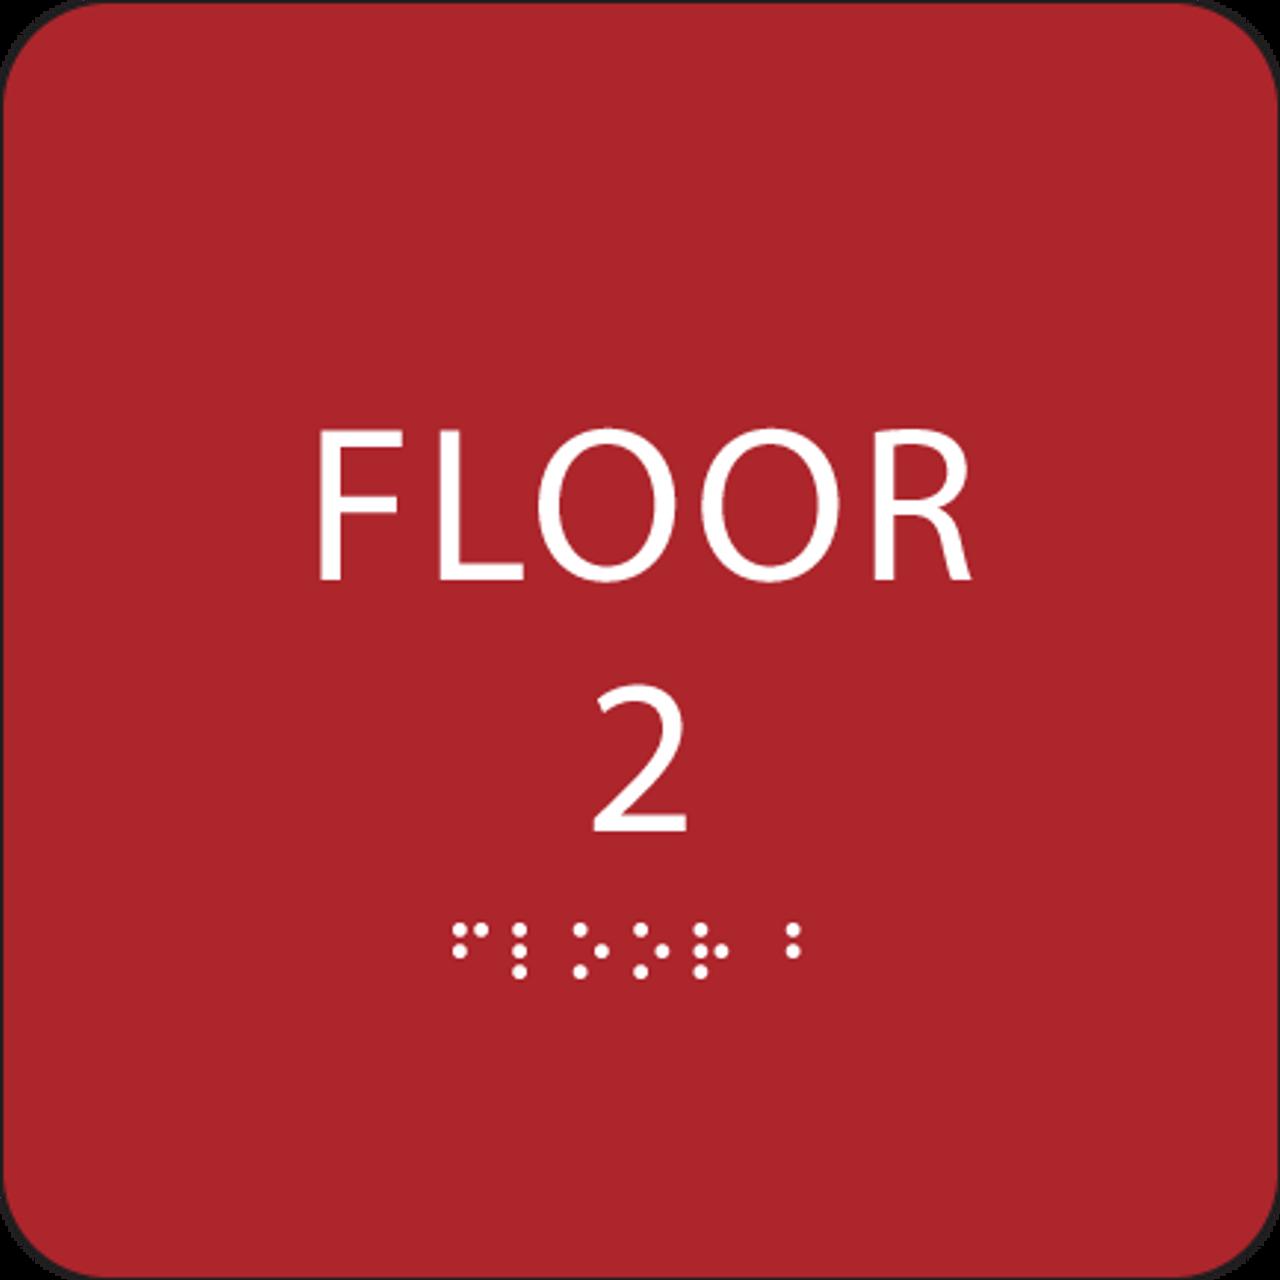 Red Floor 2 Identification Sign